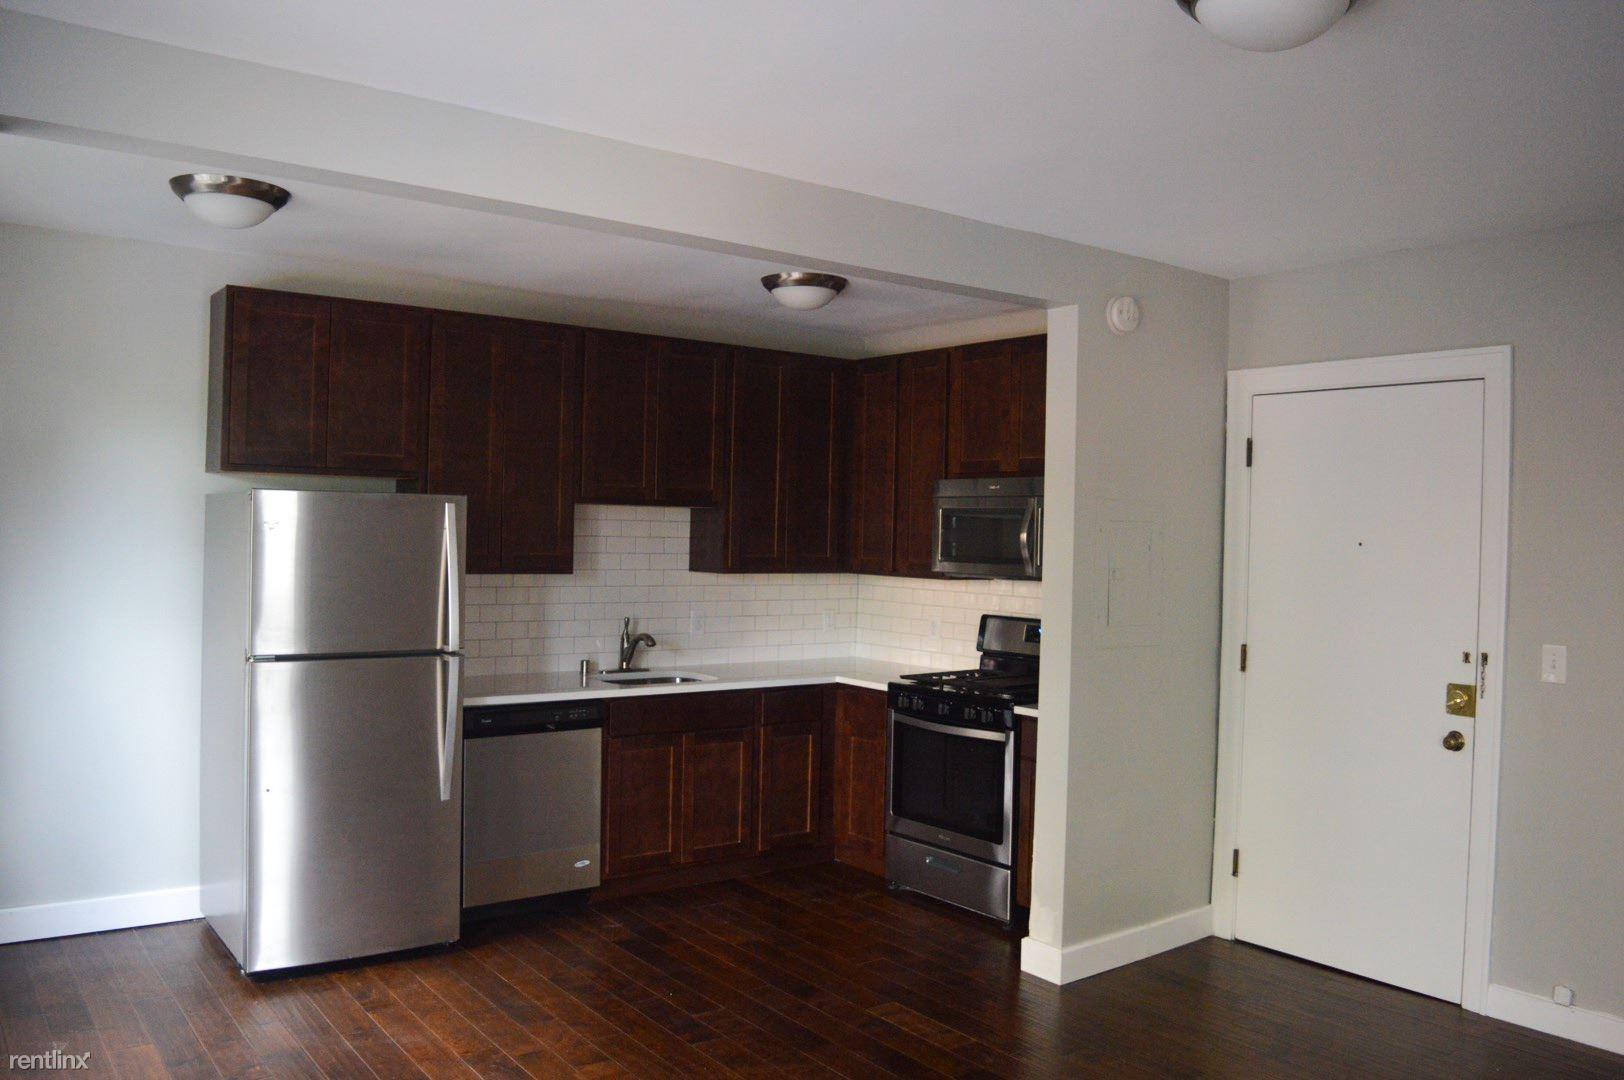 1201 Hawthorne Ave $900